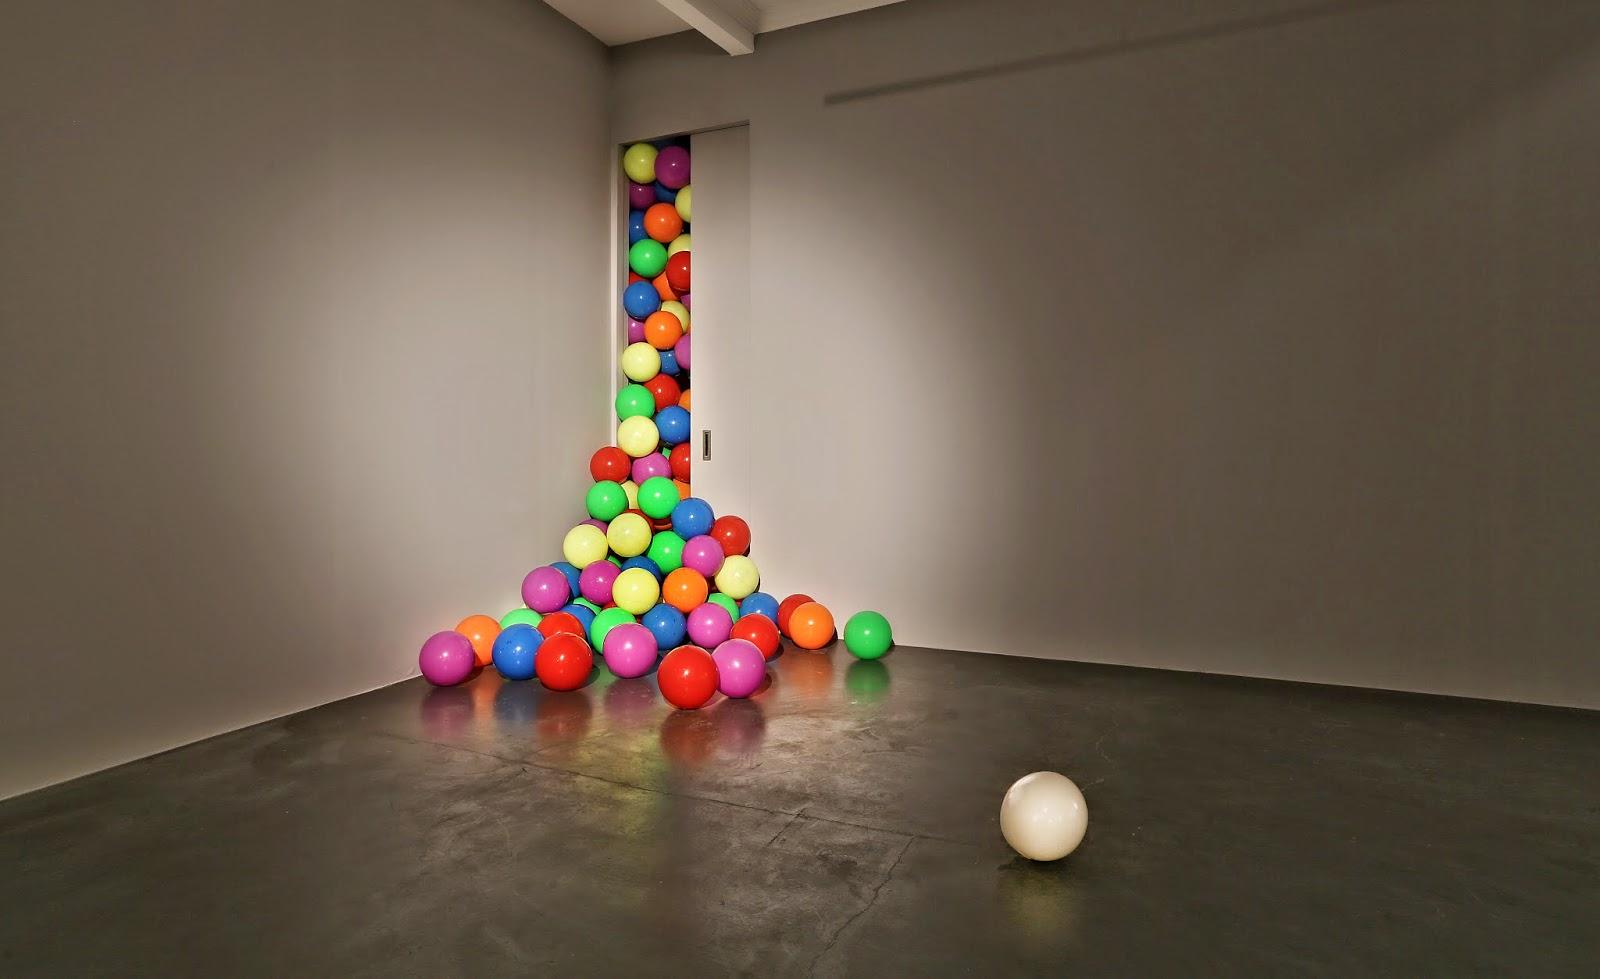 dönersen ıslık çal balls installation